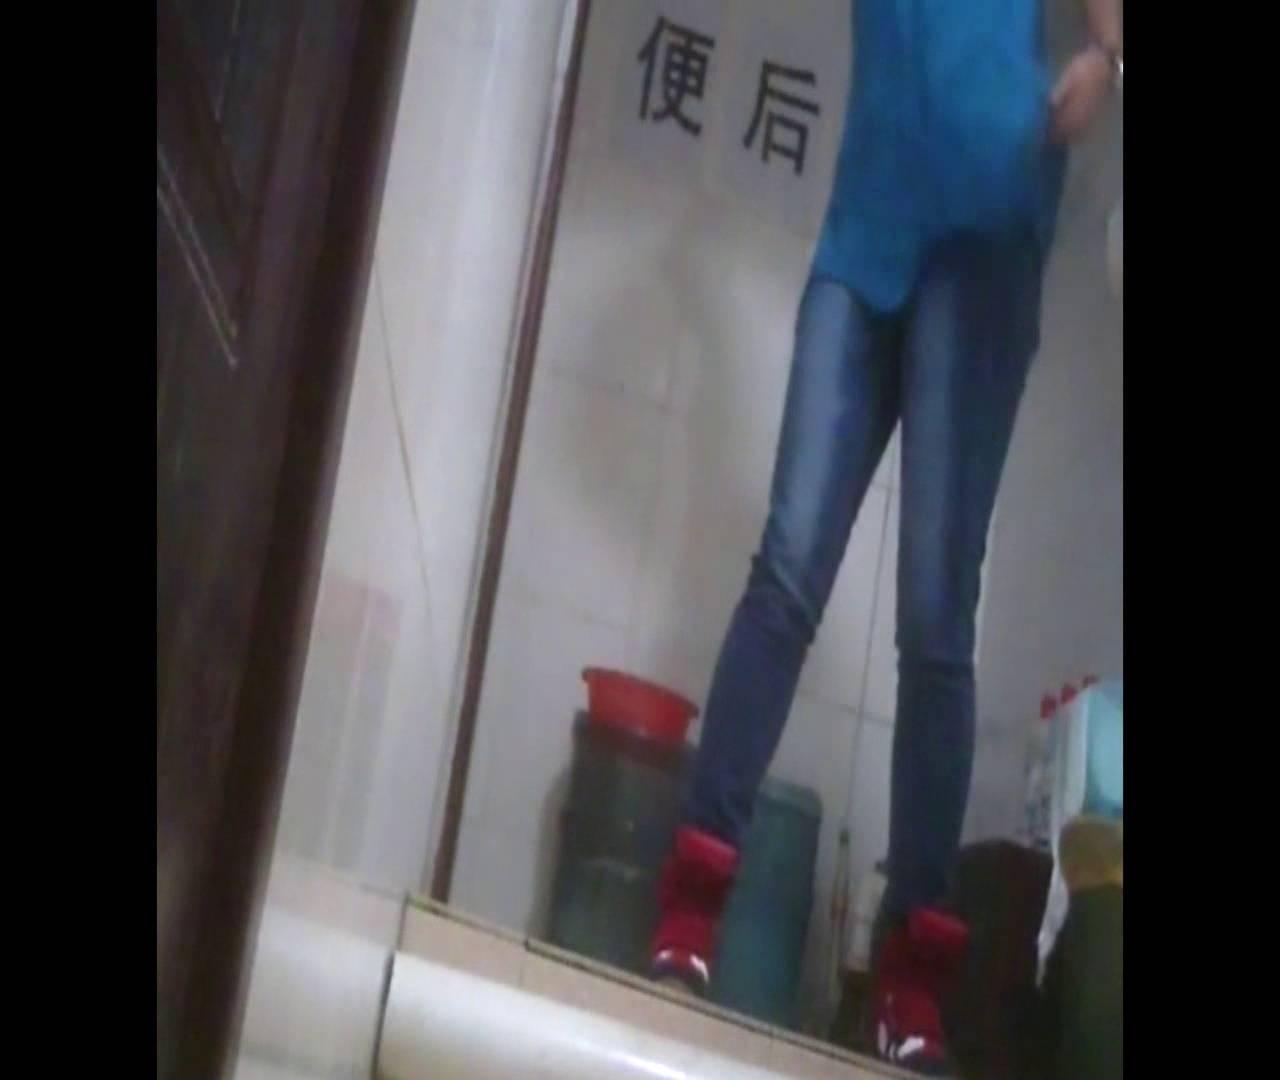 Vol.37 豊満な胸を持つマッシュルームカットな彼女 洗面所シーン 性交動画流出 57画像 56